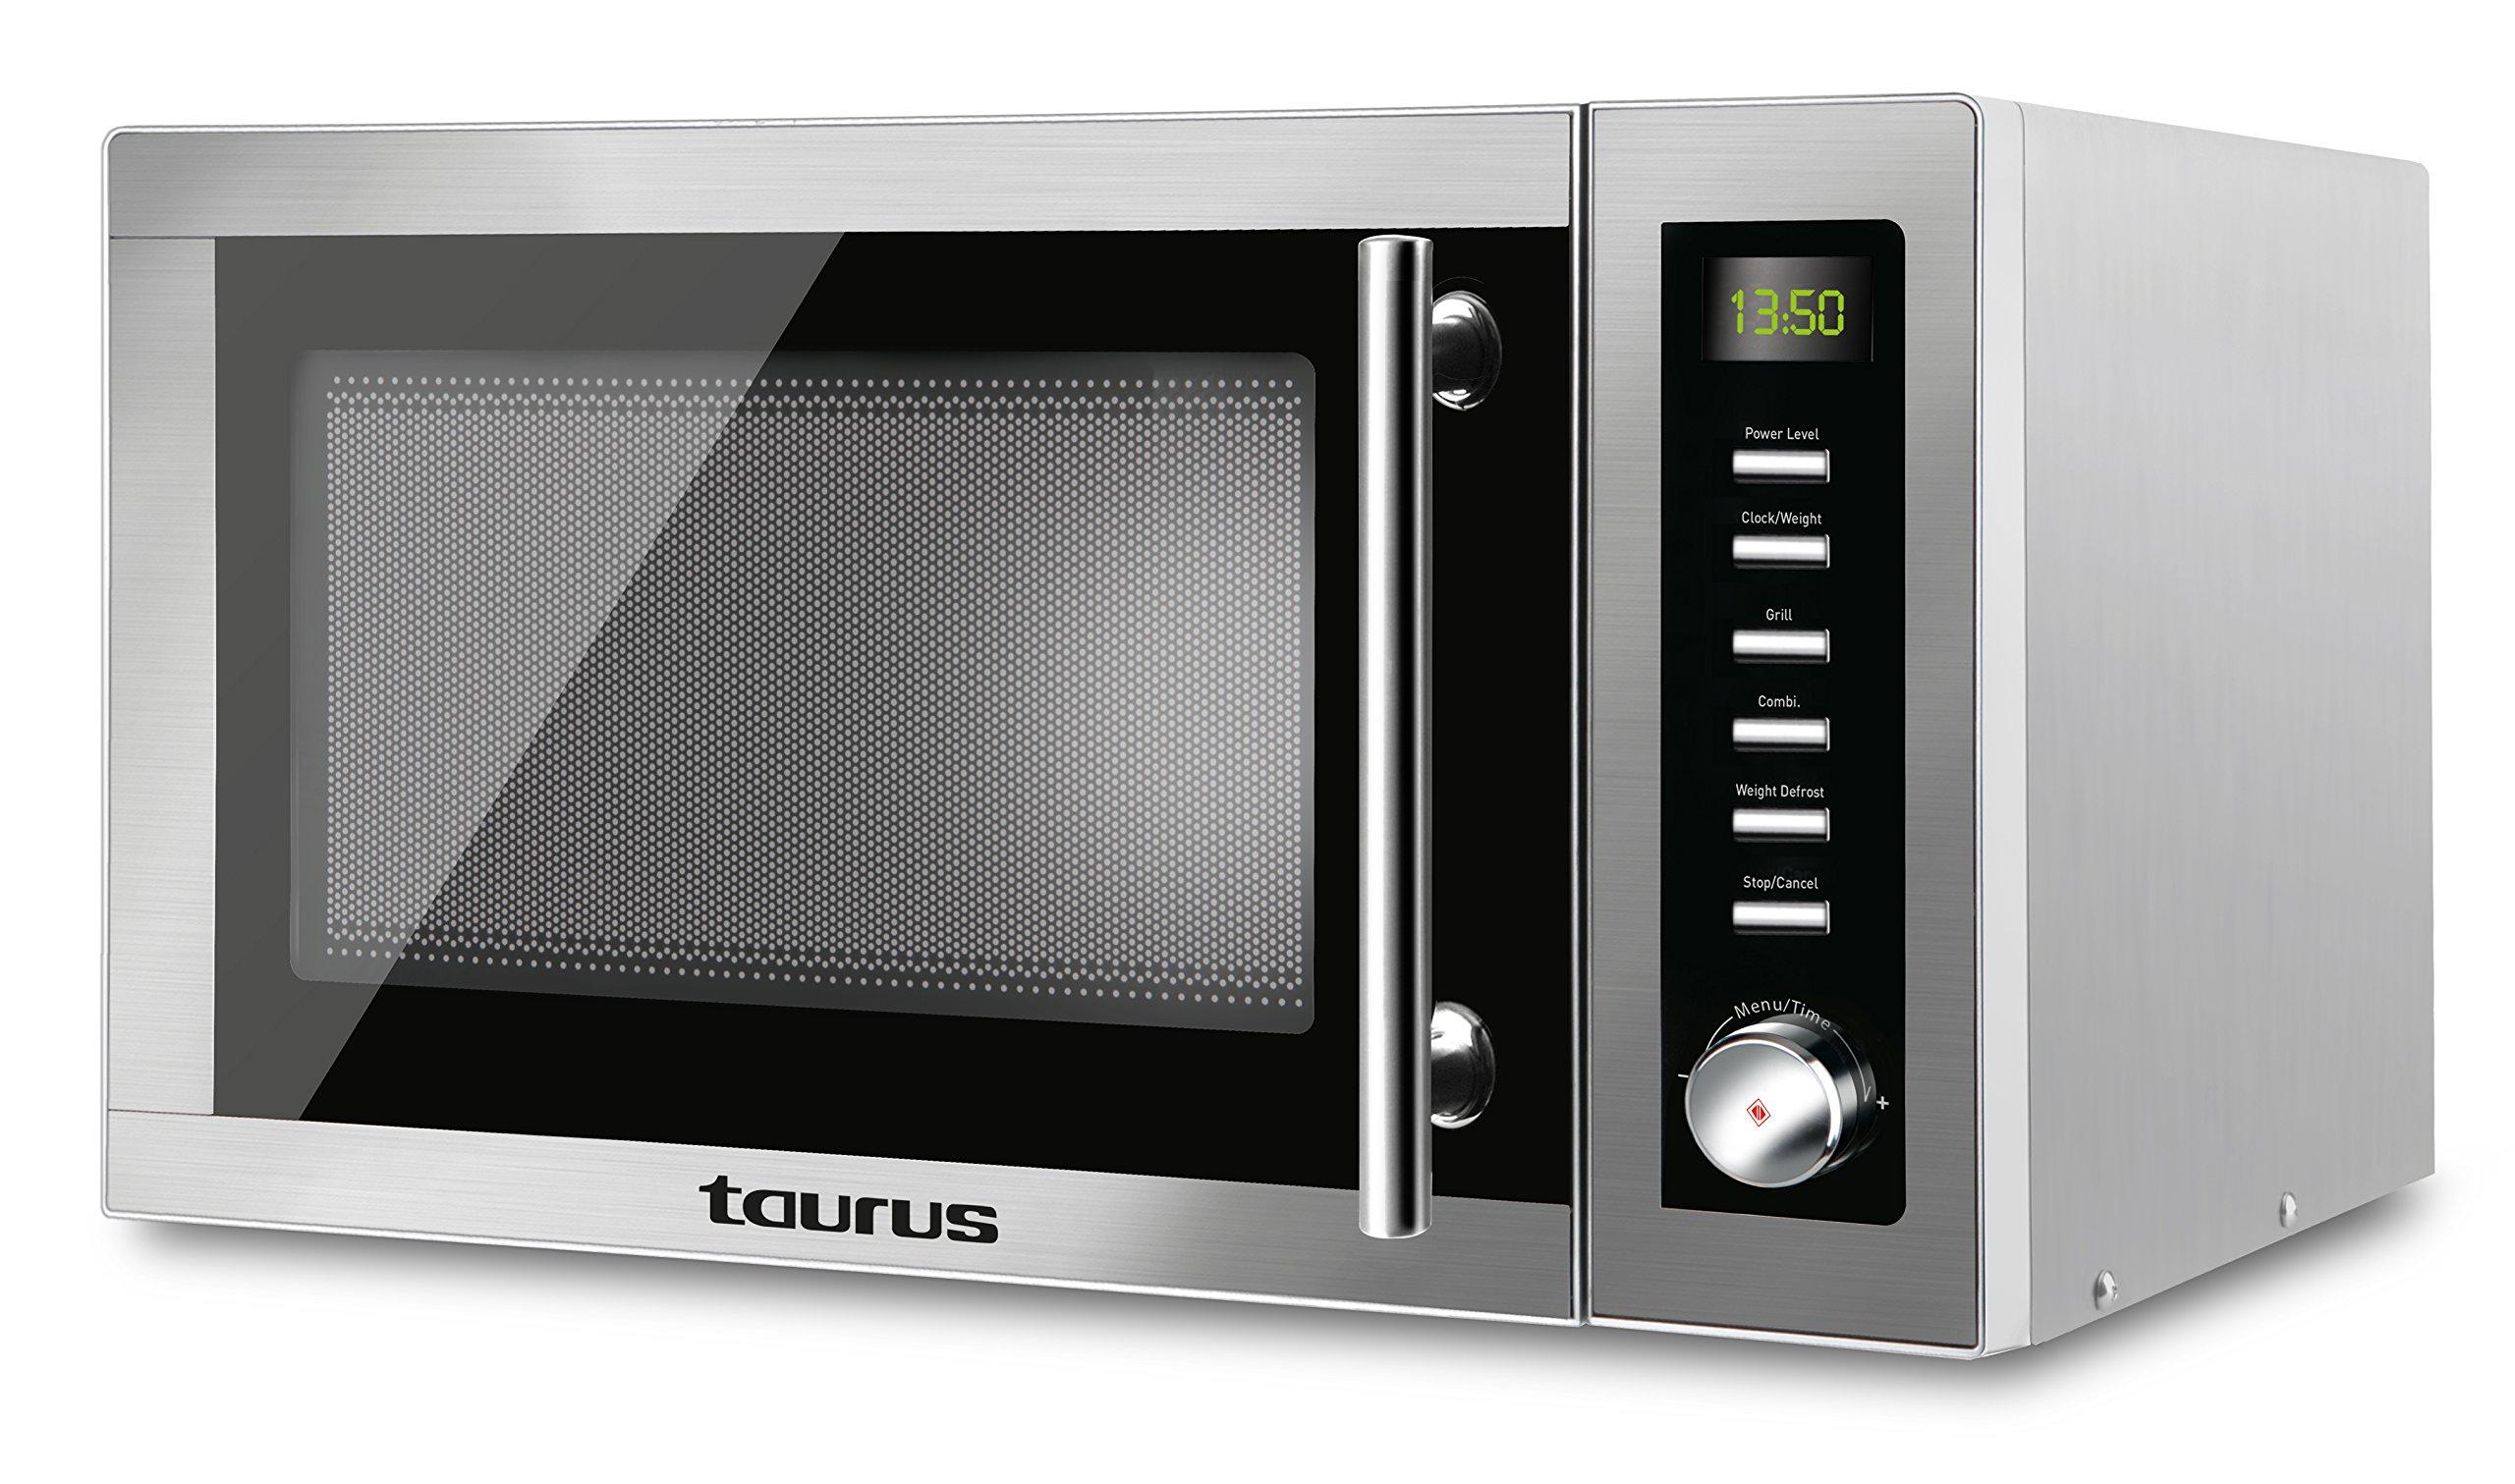 Taurus Laurent-Microondas (900 W, 25 litros Capacidad, 14 Niveles de Potencia, Multiples Funciones), Gris product image